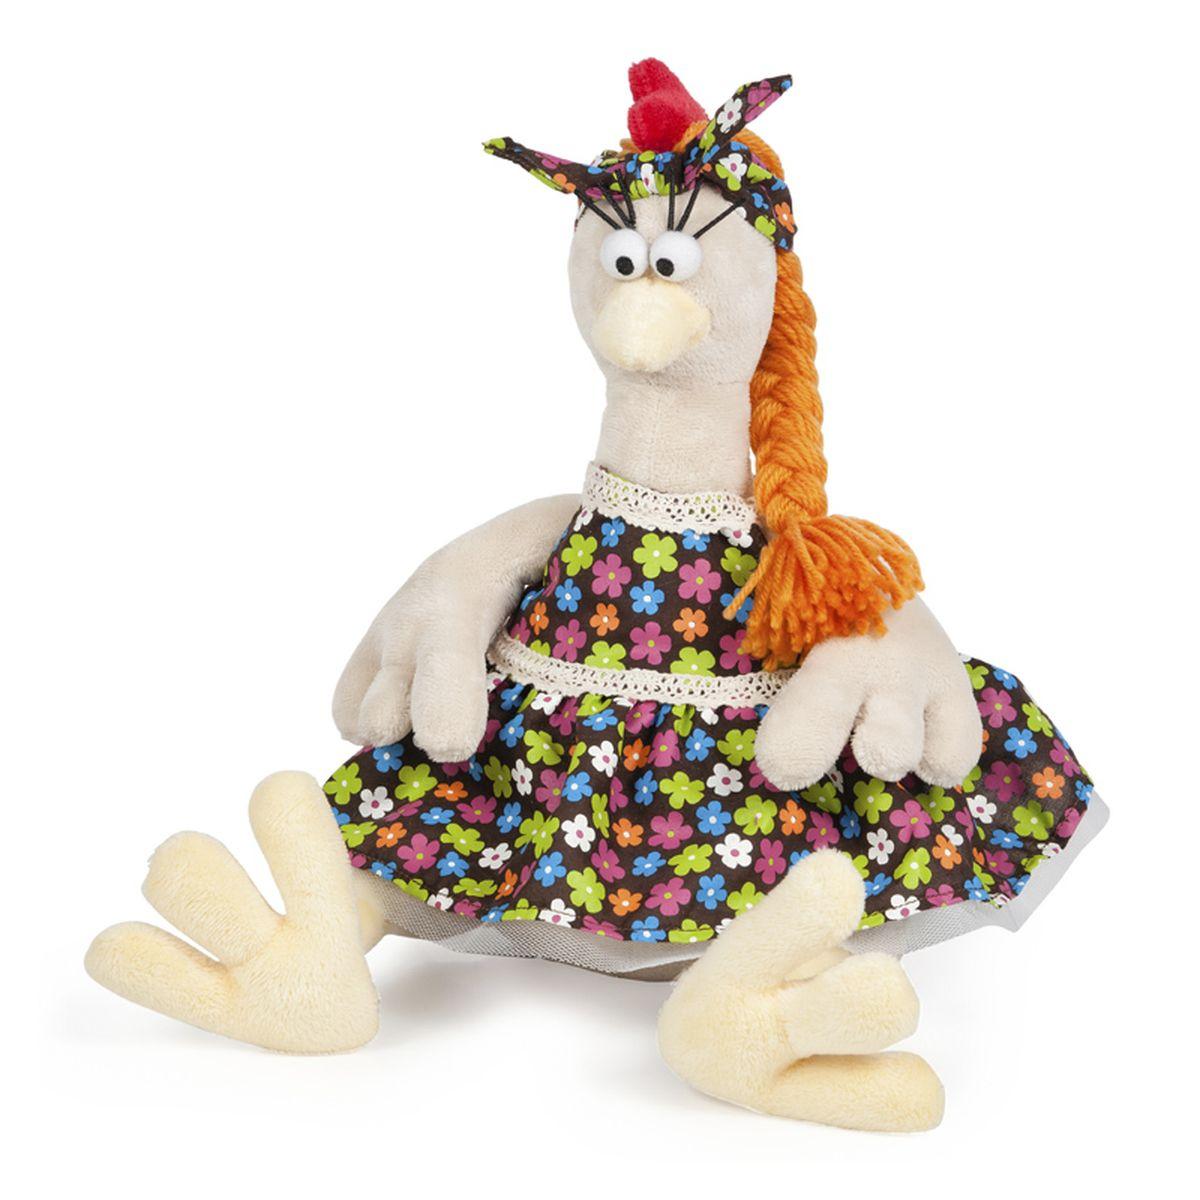 Maxi Toys Мягкая игрушка Курочка в сарафане 20 смMT-TSA-8309-20